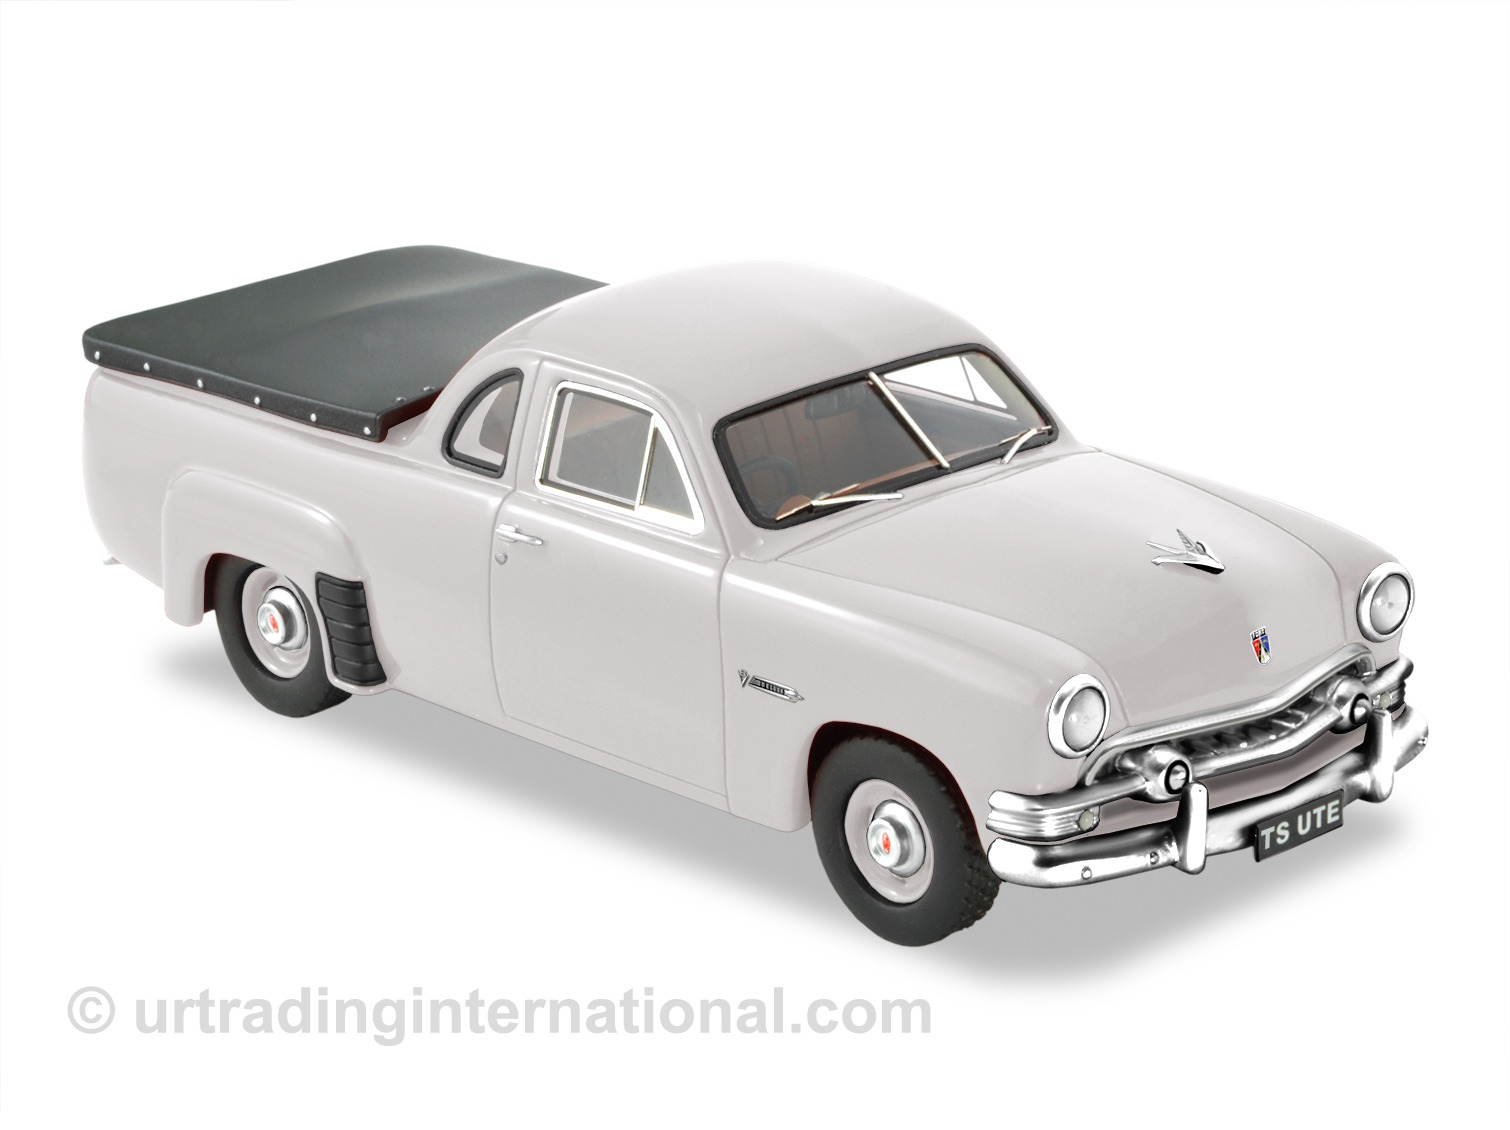 1951 Ford Custom Twin Spinner Ute – Tan